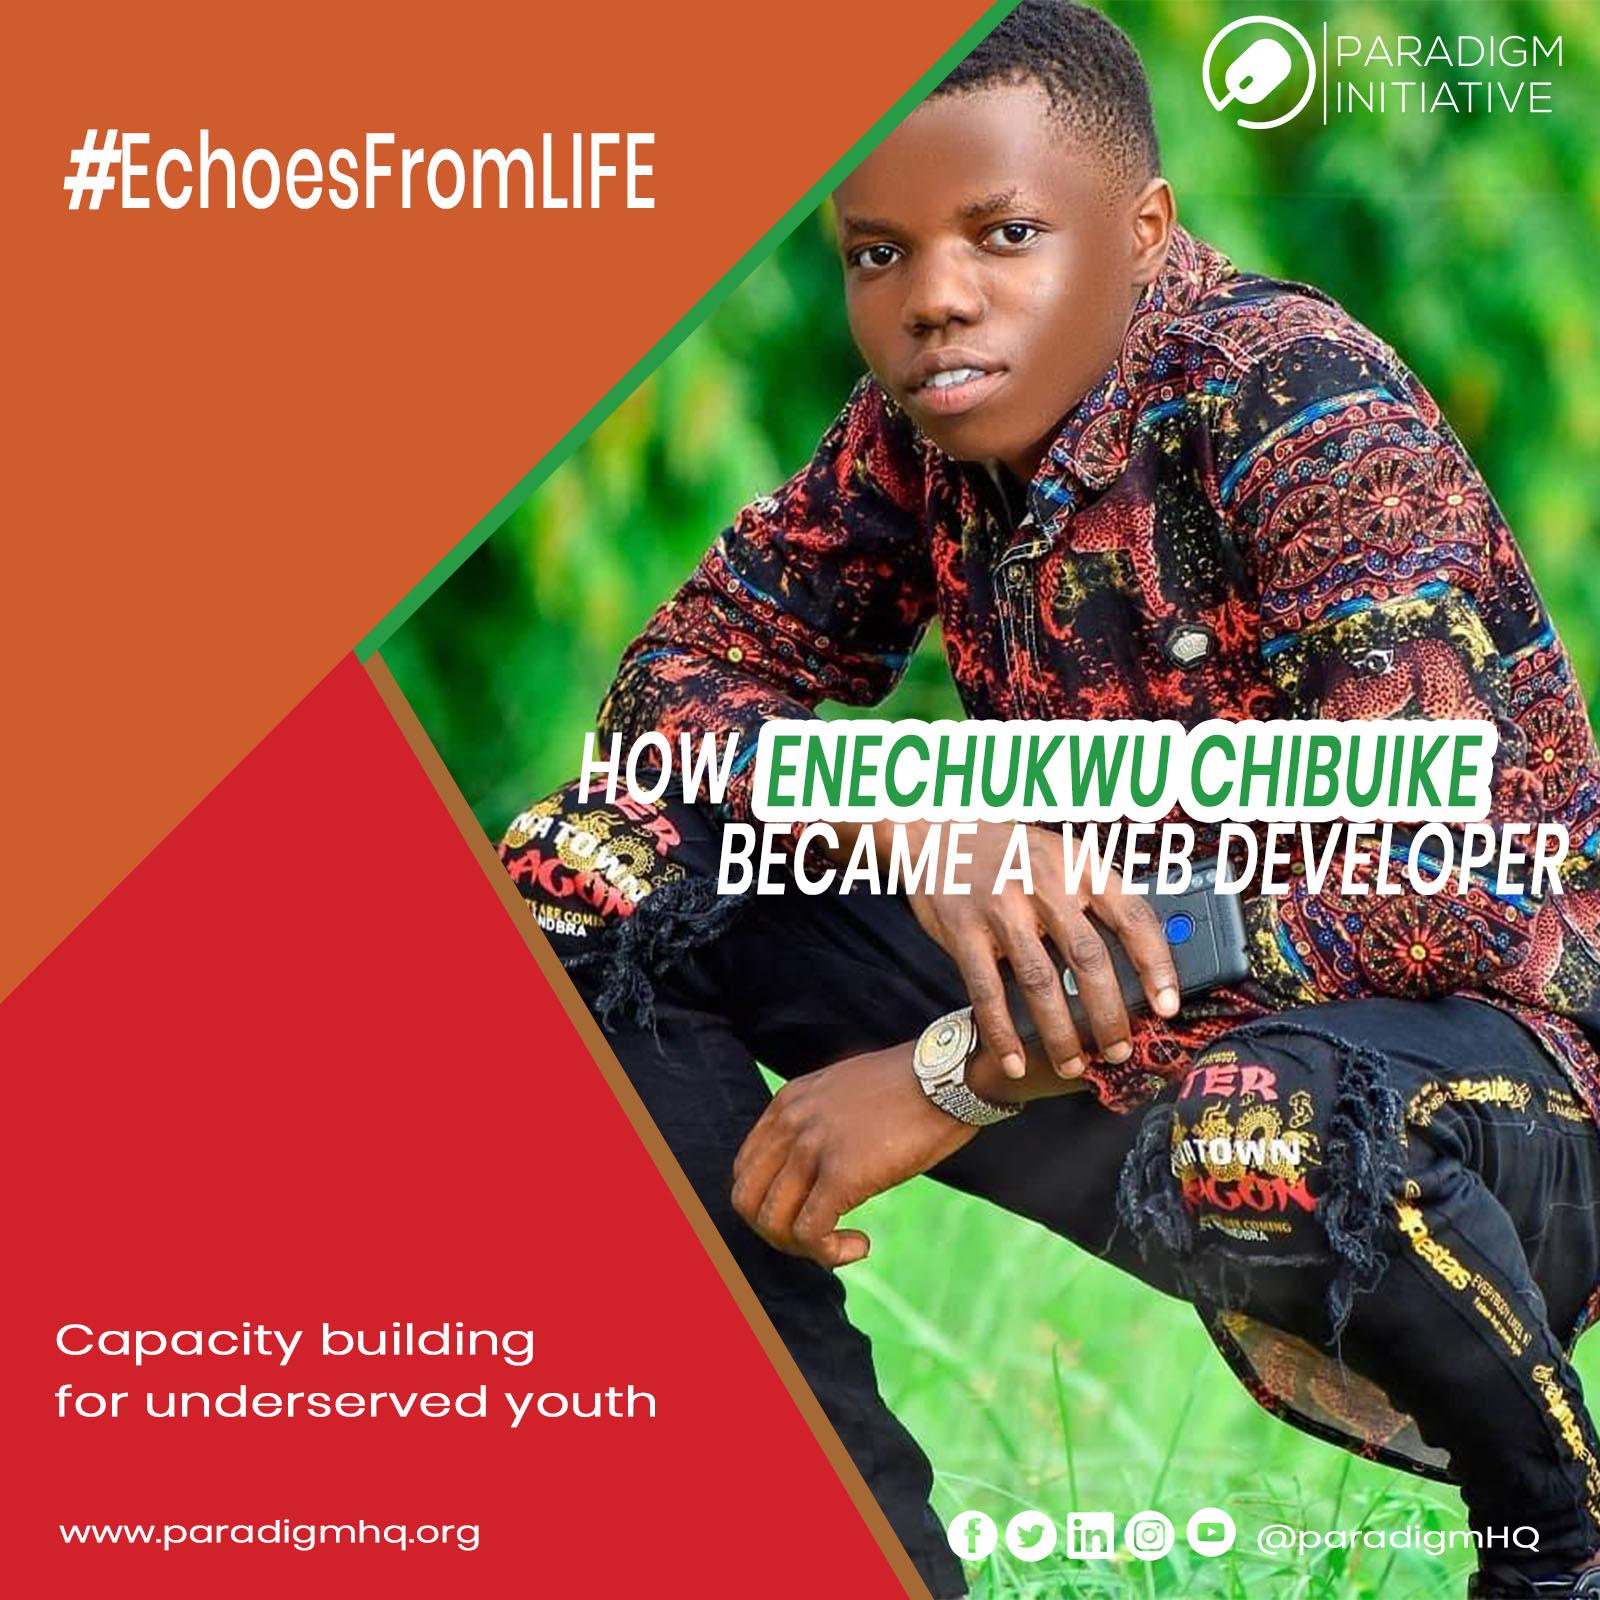 #EchoesFromLIFE: HOW ENECHUKWU CHIBUIKE BECAME A WEB DEVELOPER.